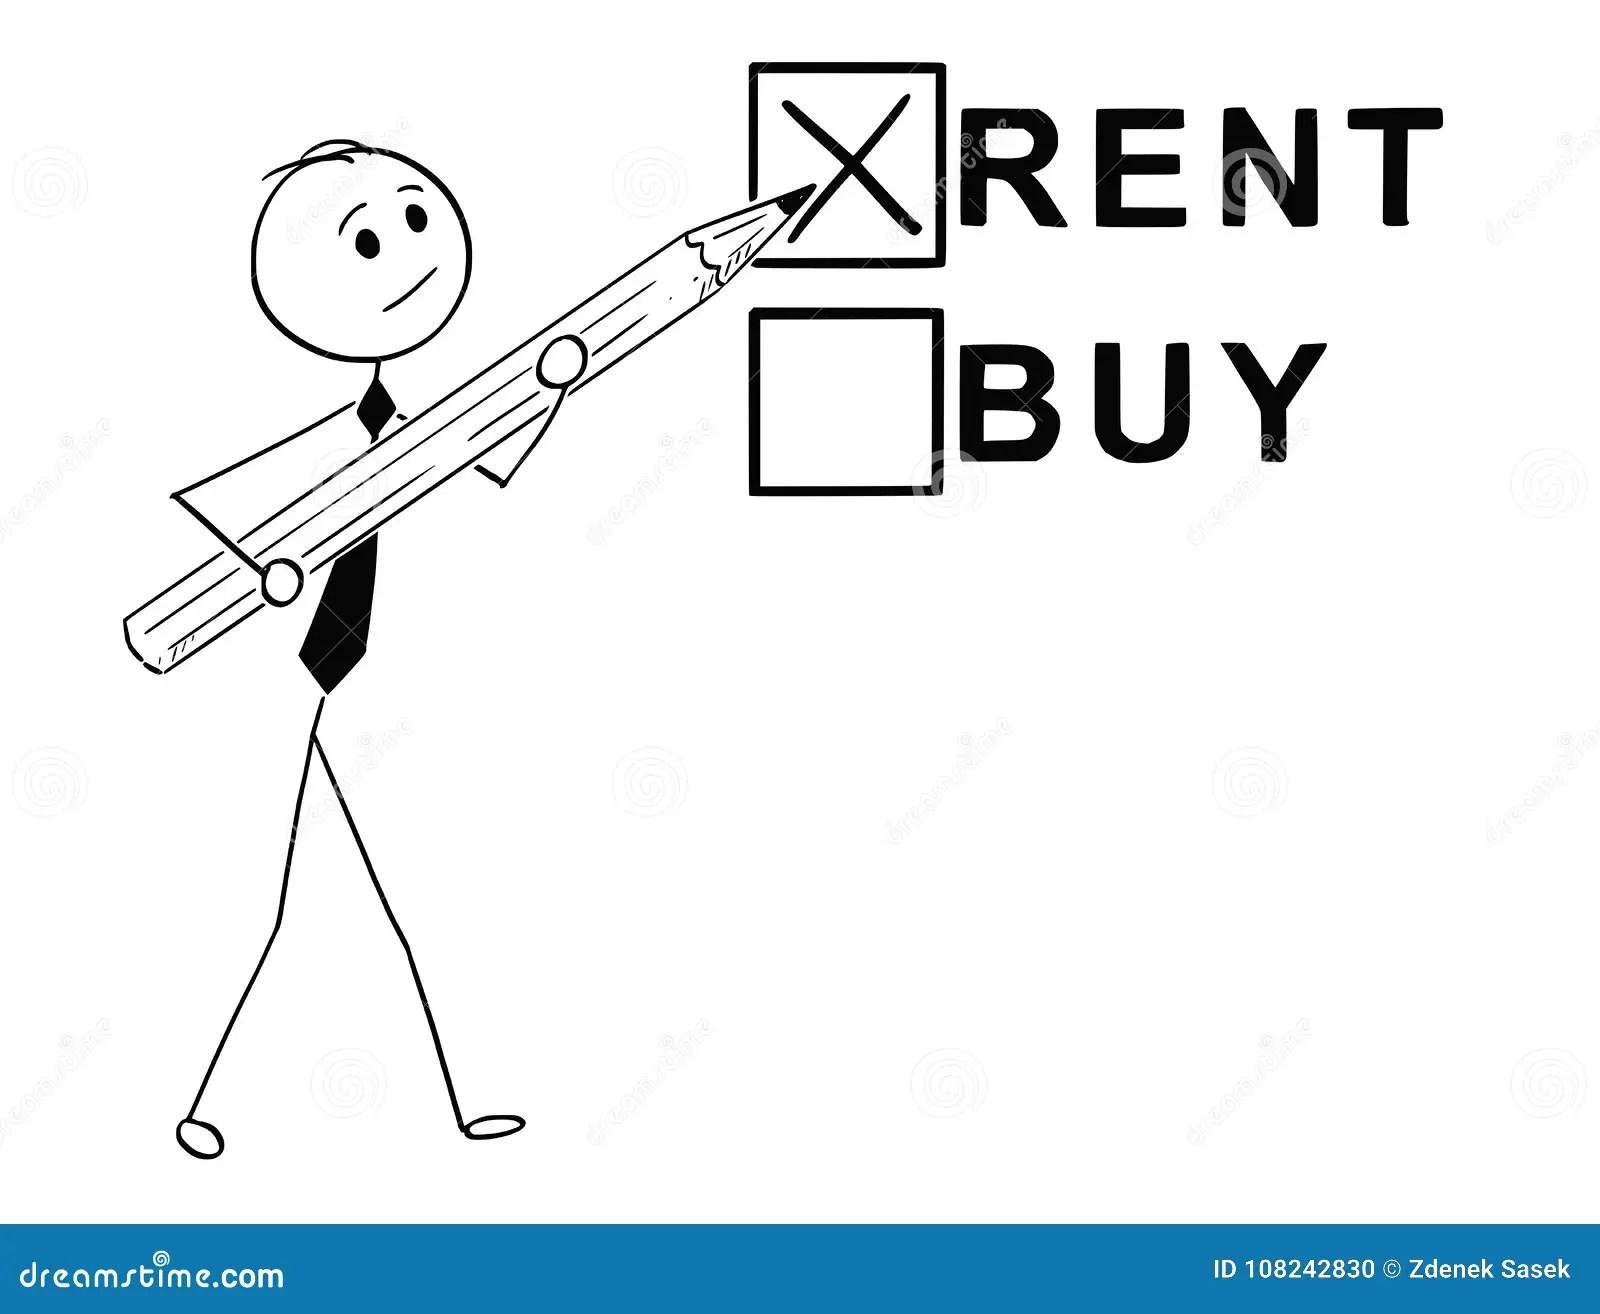 Rent Metaphor Stock Photo